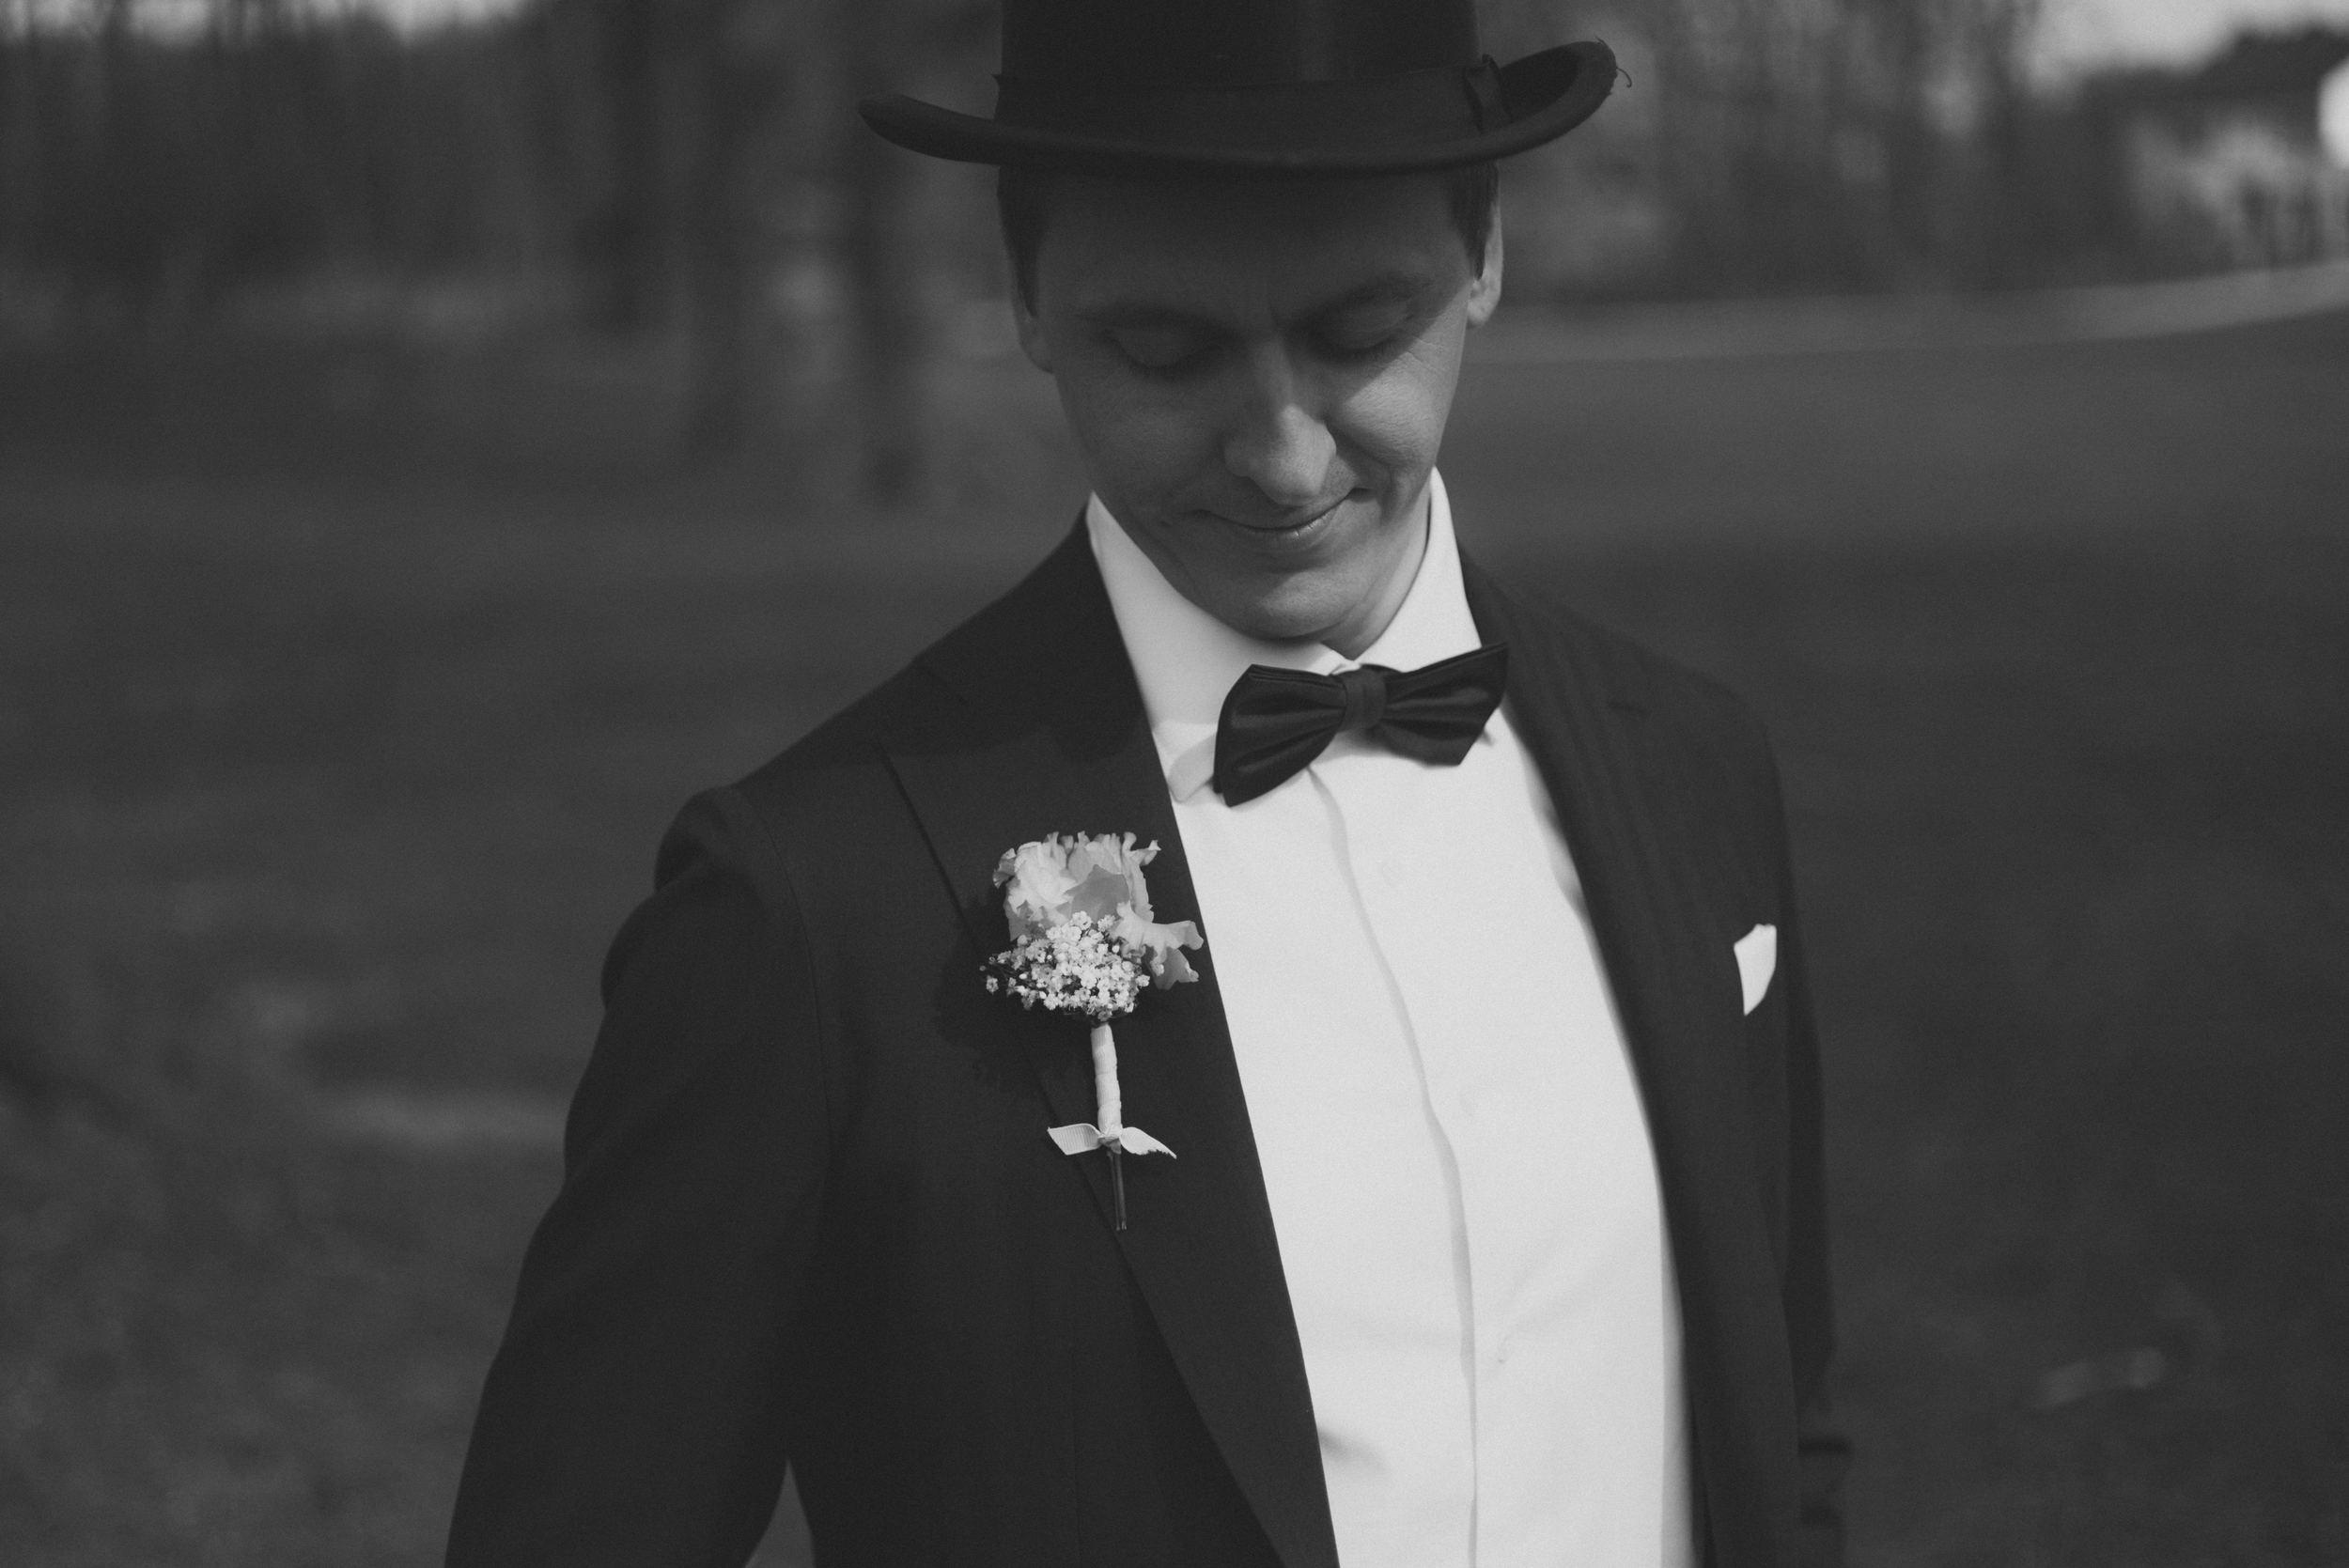 Hochzeitsfotograf-Schlossruine-Hertefeld-Weeze-041.jpg